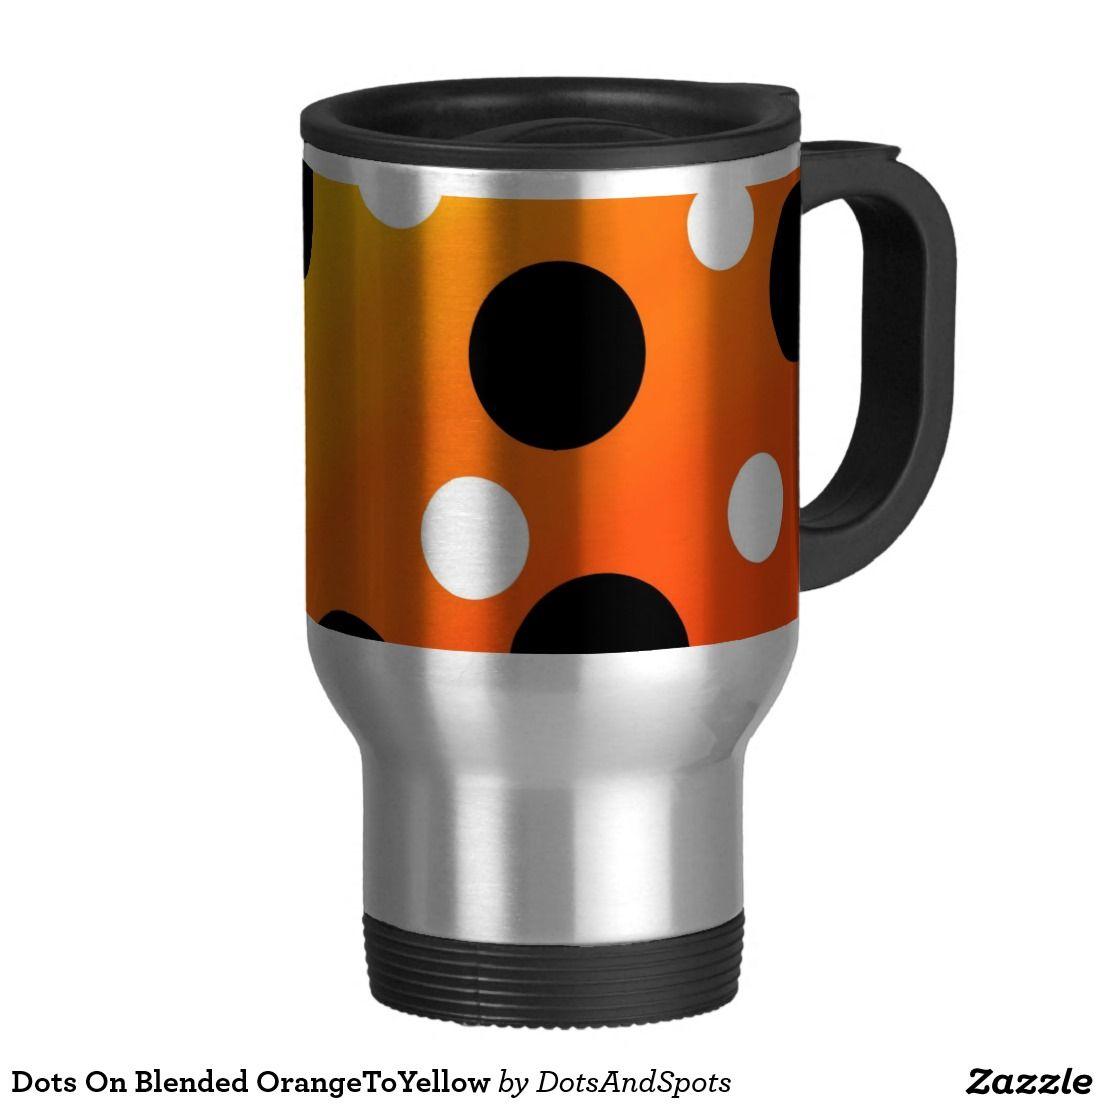 Dots On Blended OrangeToYellow 15 Oz Stainless Steel Travel Mug  http://www.zazzle.com/dots_on_blended_orangetoyellow_15_oz_stainless_steel_travel_mug-168980375923600307?rf=238588924226571373